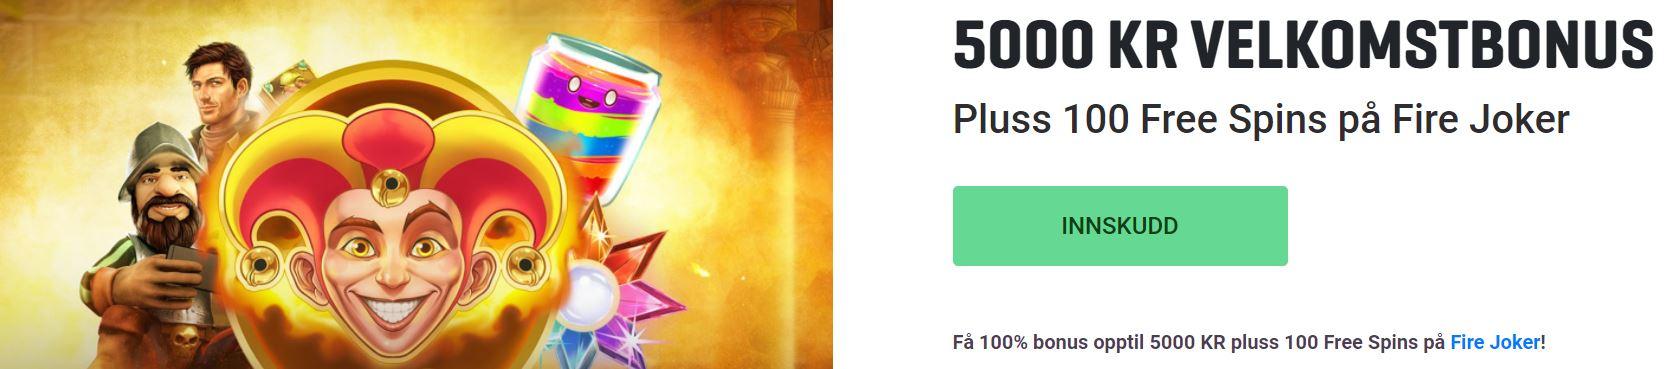 guts 5000 kr bonus og 100 spins